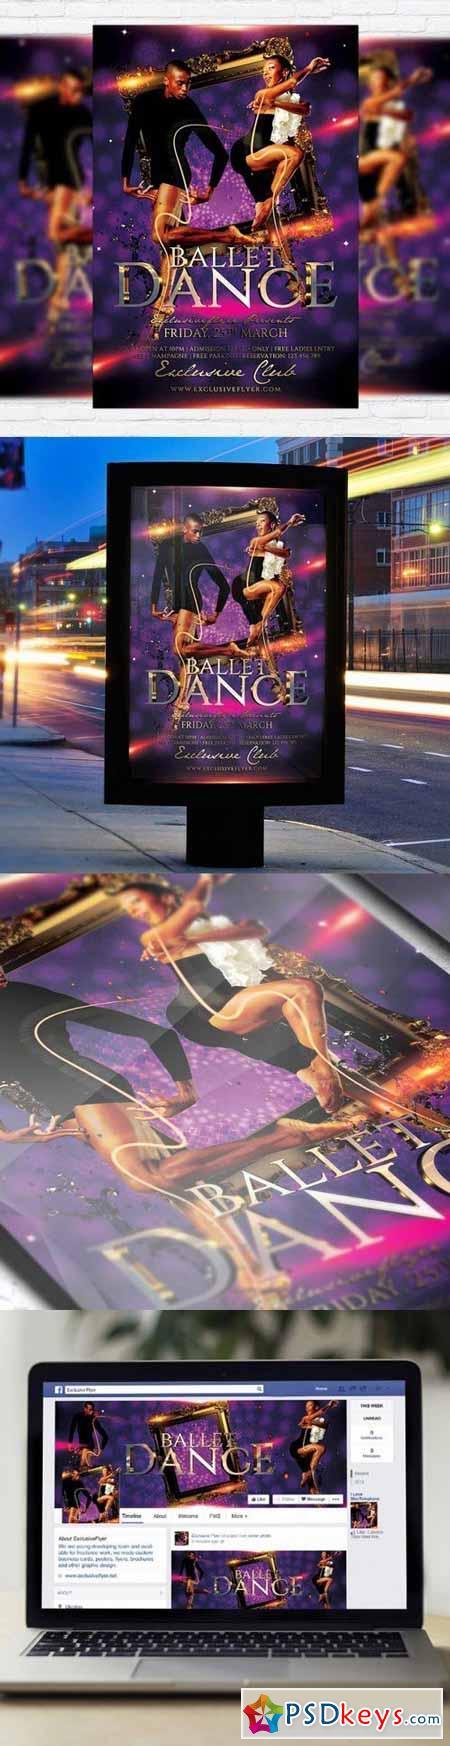 Ballet Dance Flyer PSD Template + Facebook Cover